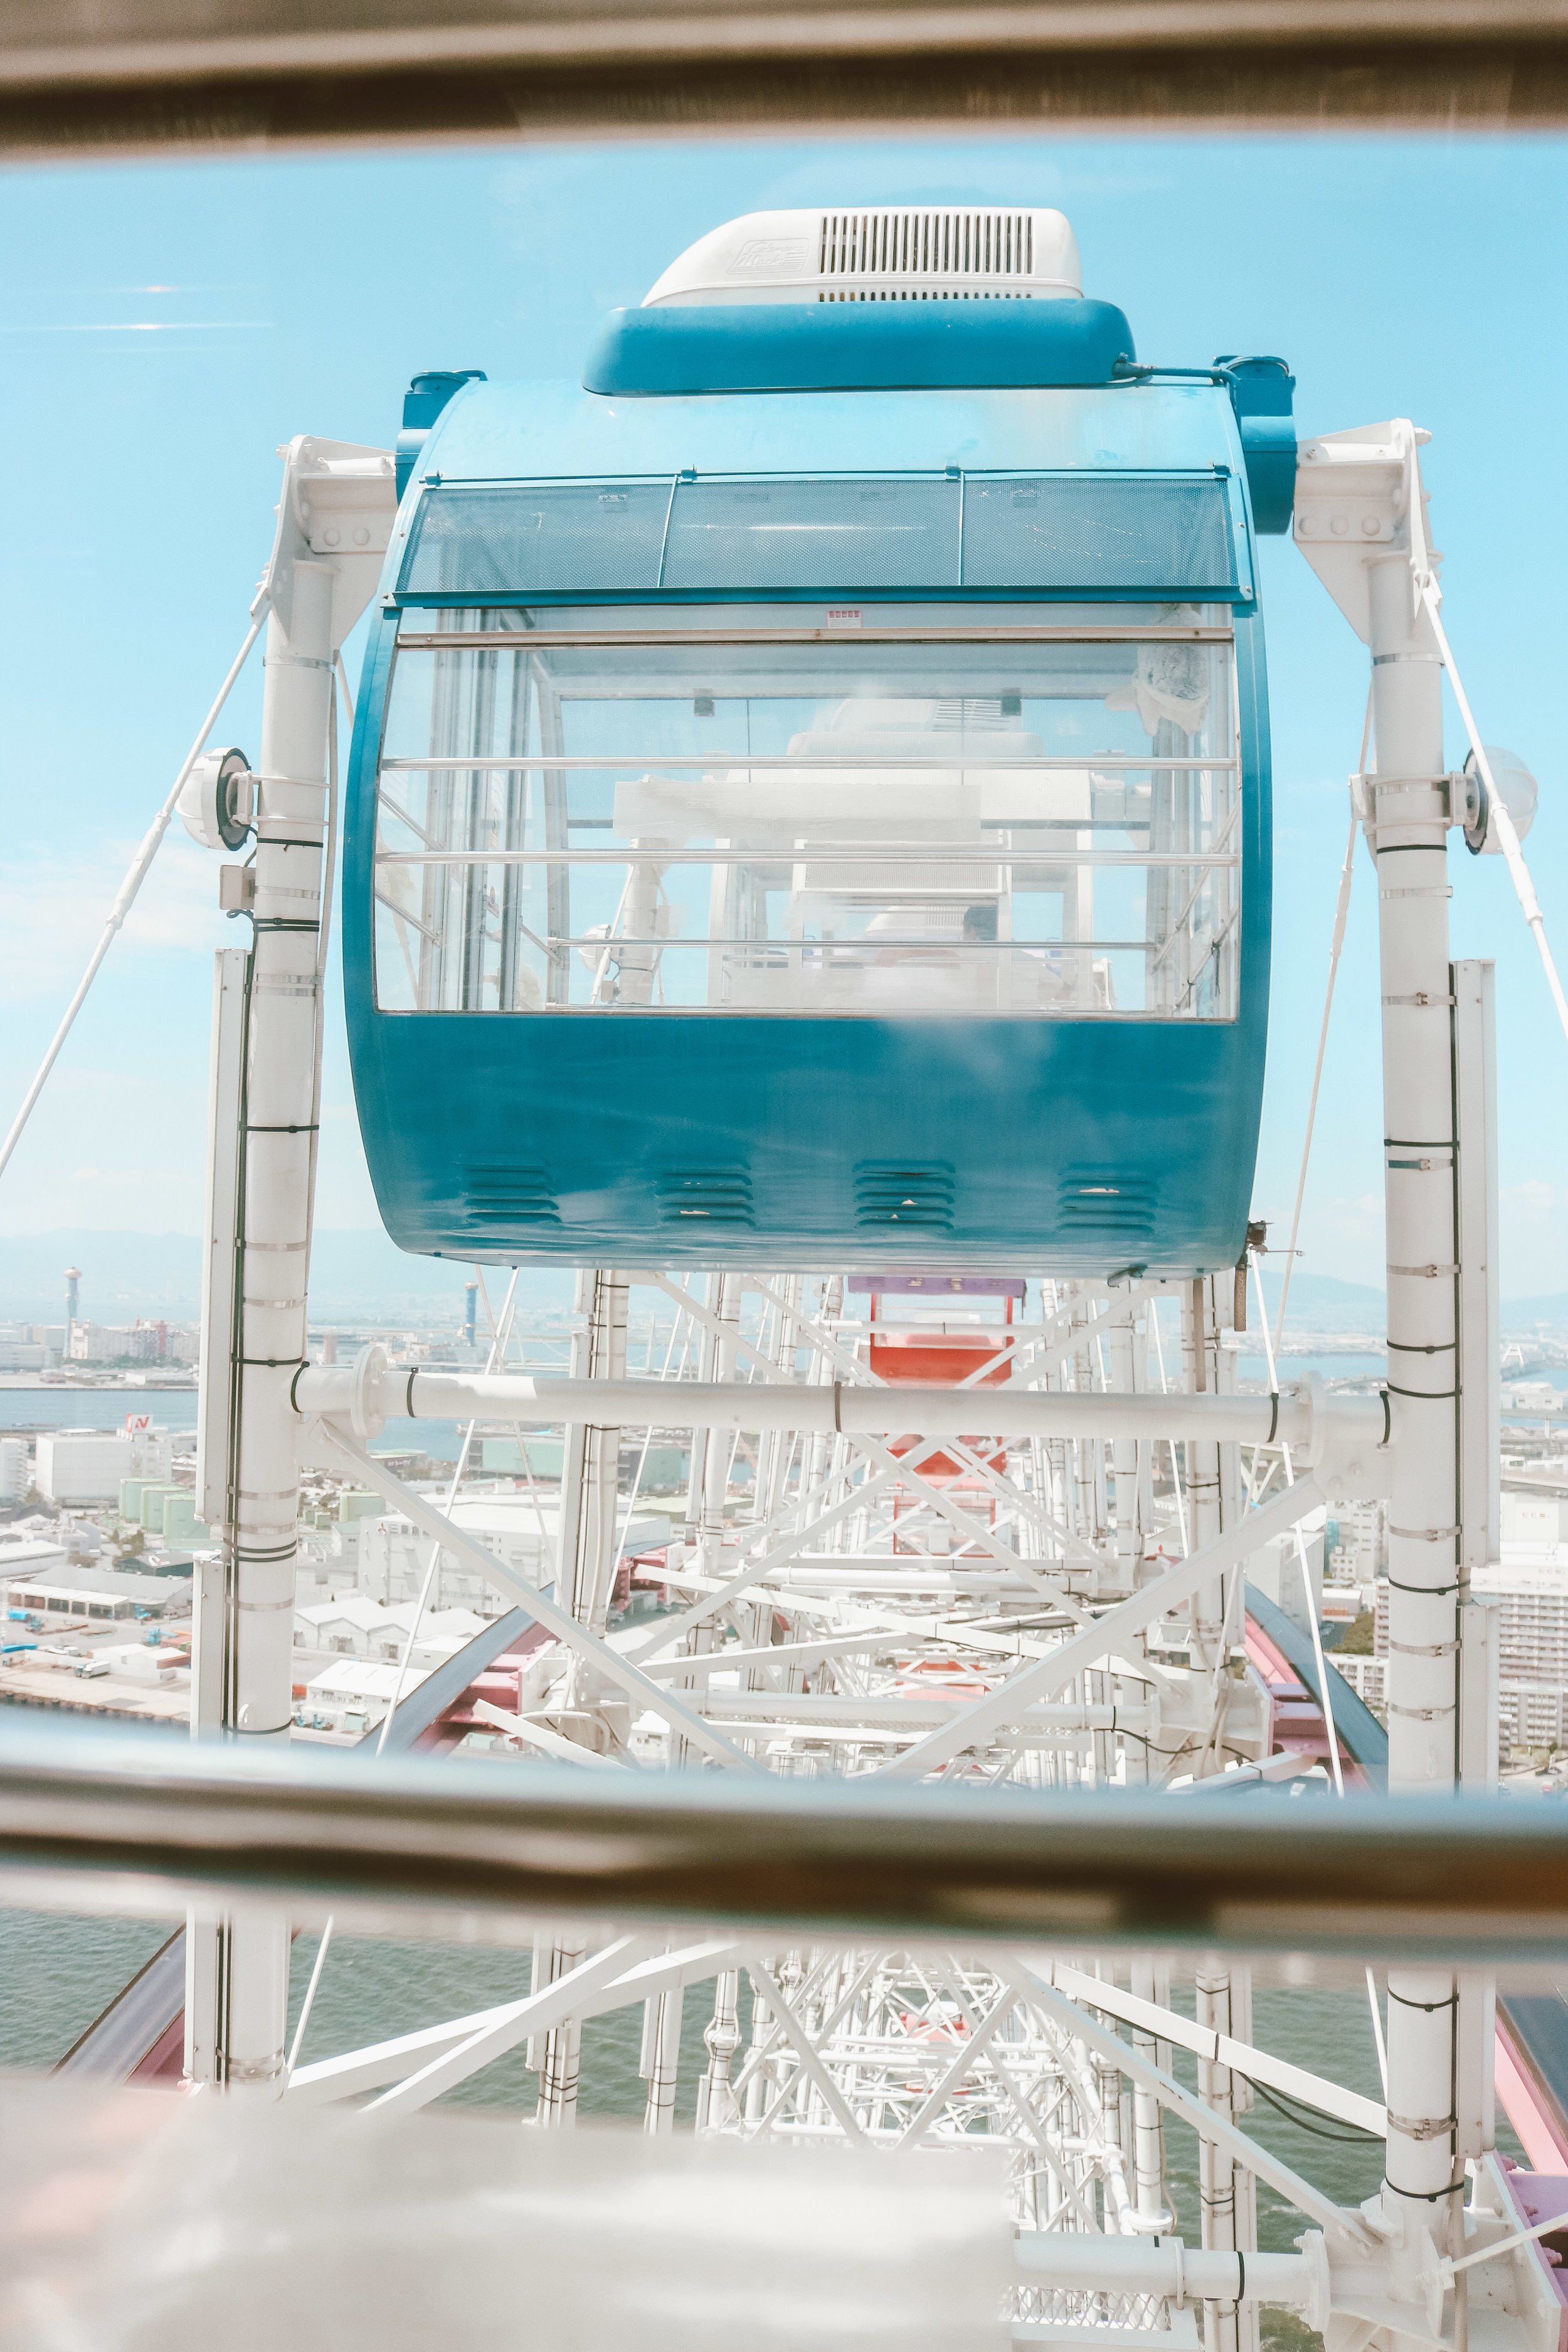 Osaka Aquarium and Tempozan Ferris Wheel | SaltWaterVibes